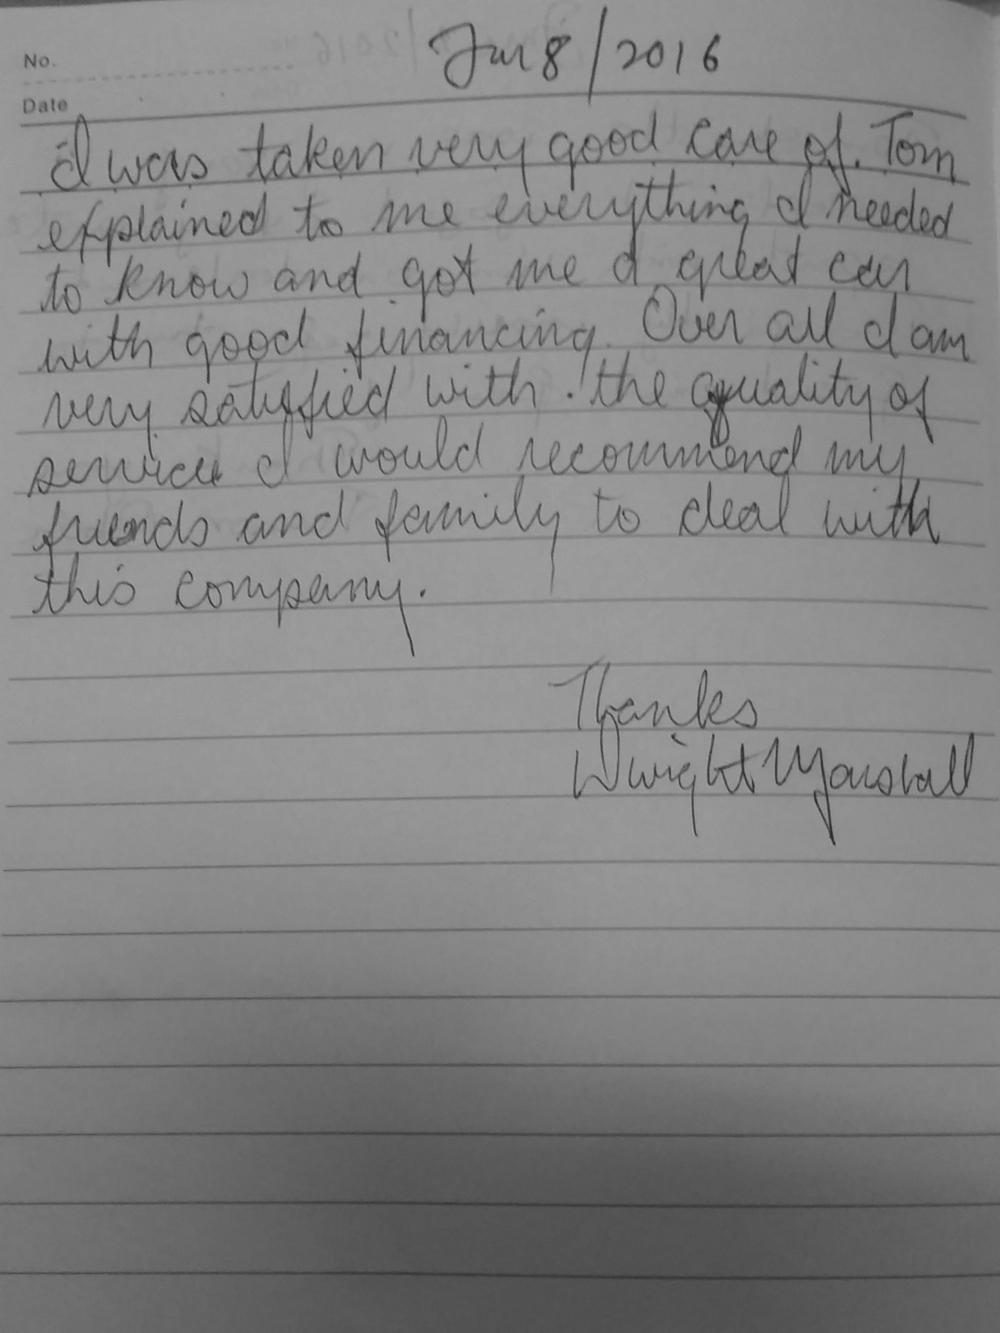 Dwight Marshall_testimonial.jpg